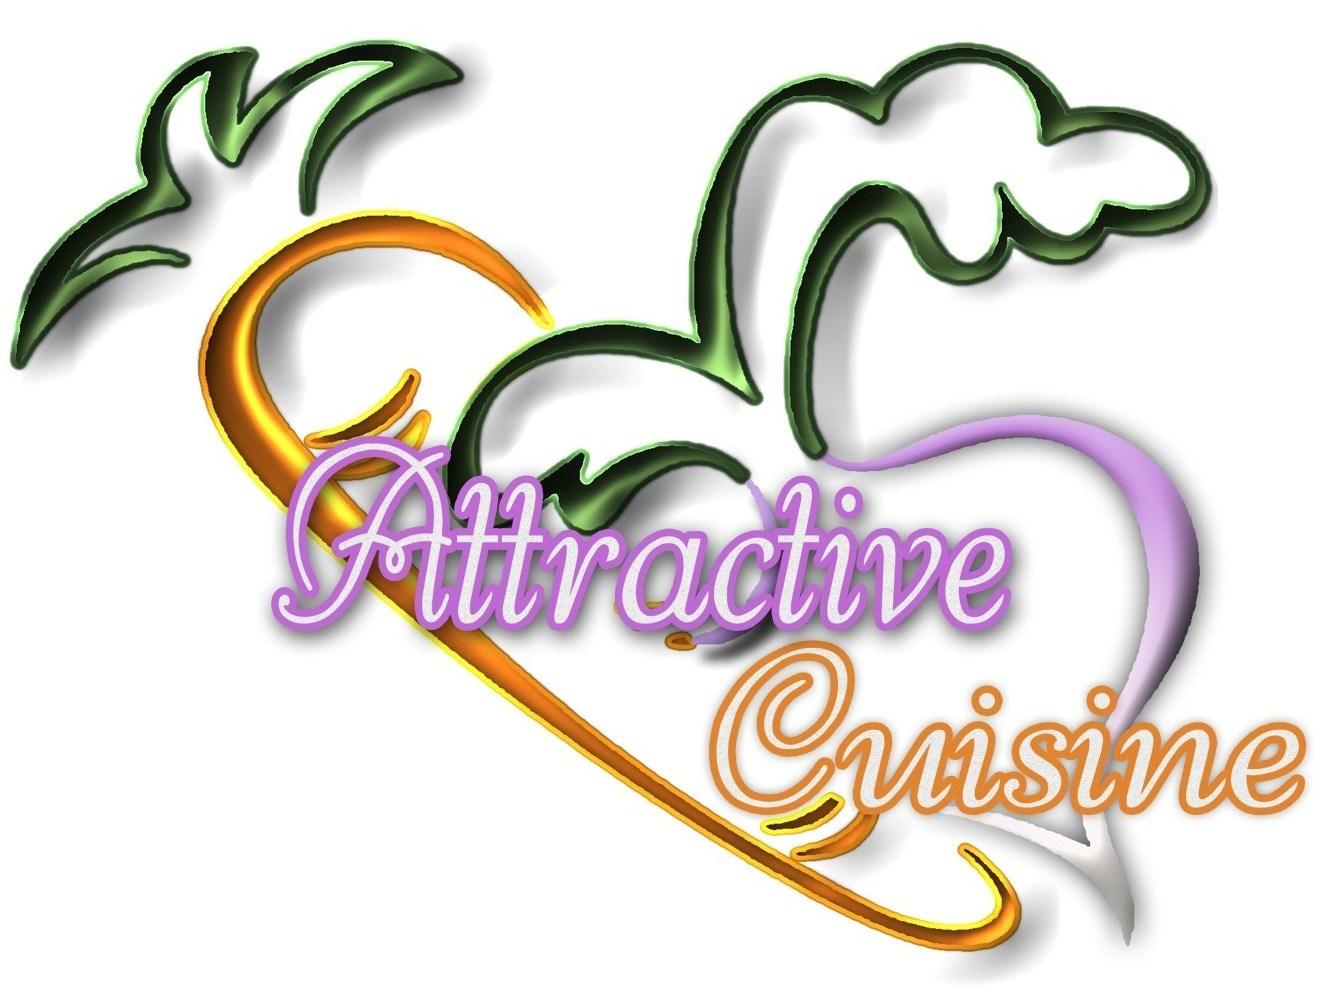 Attractive Cuisine LLC